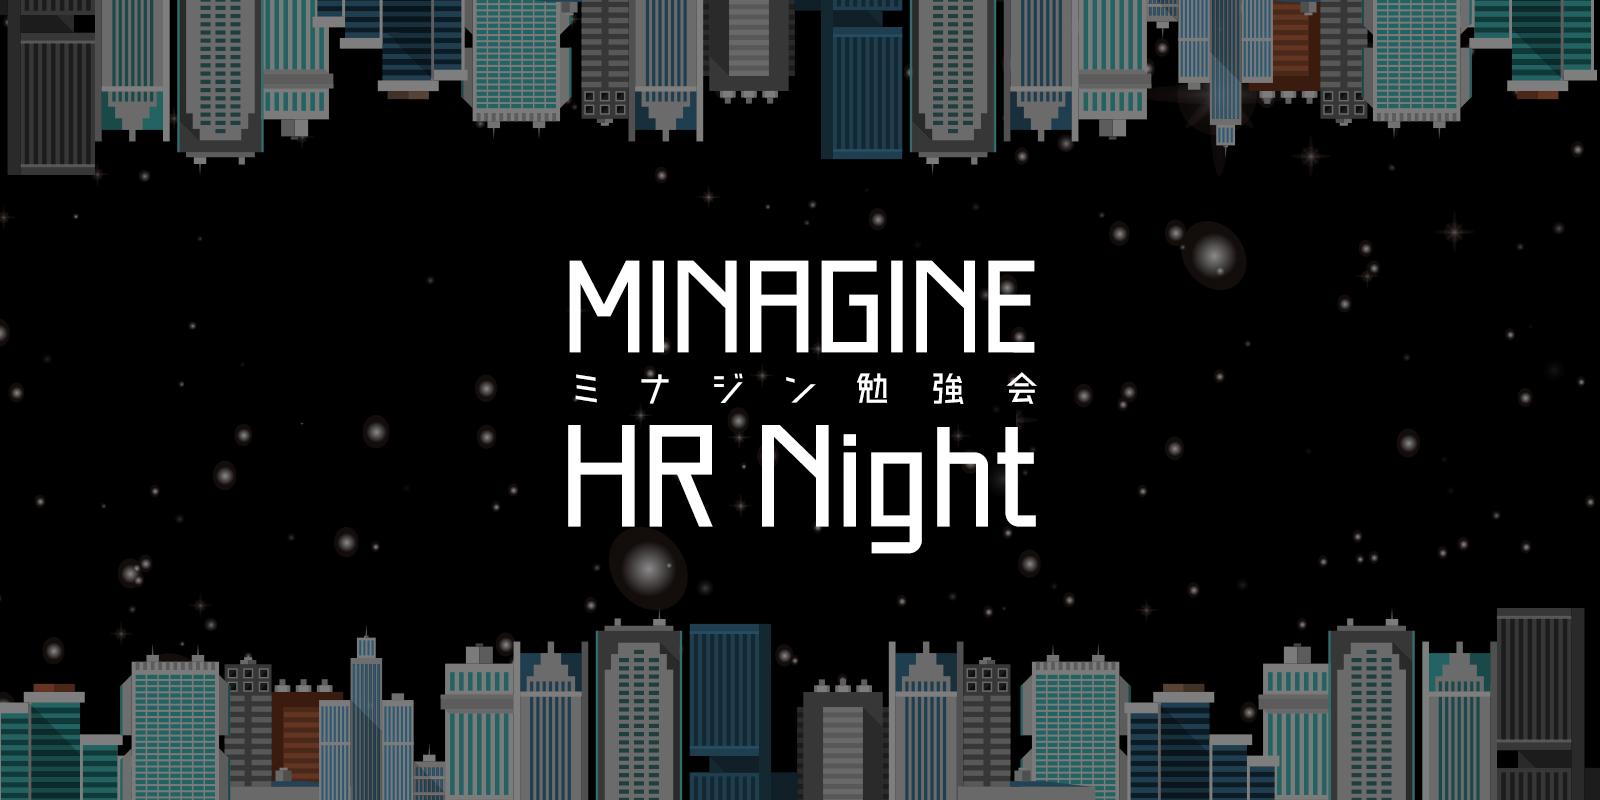 MINAGINE HR Night